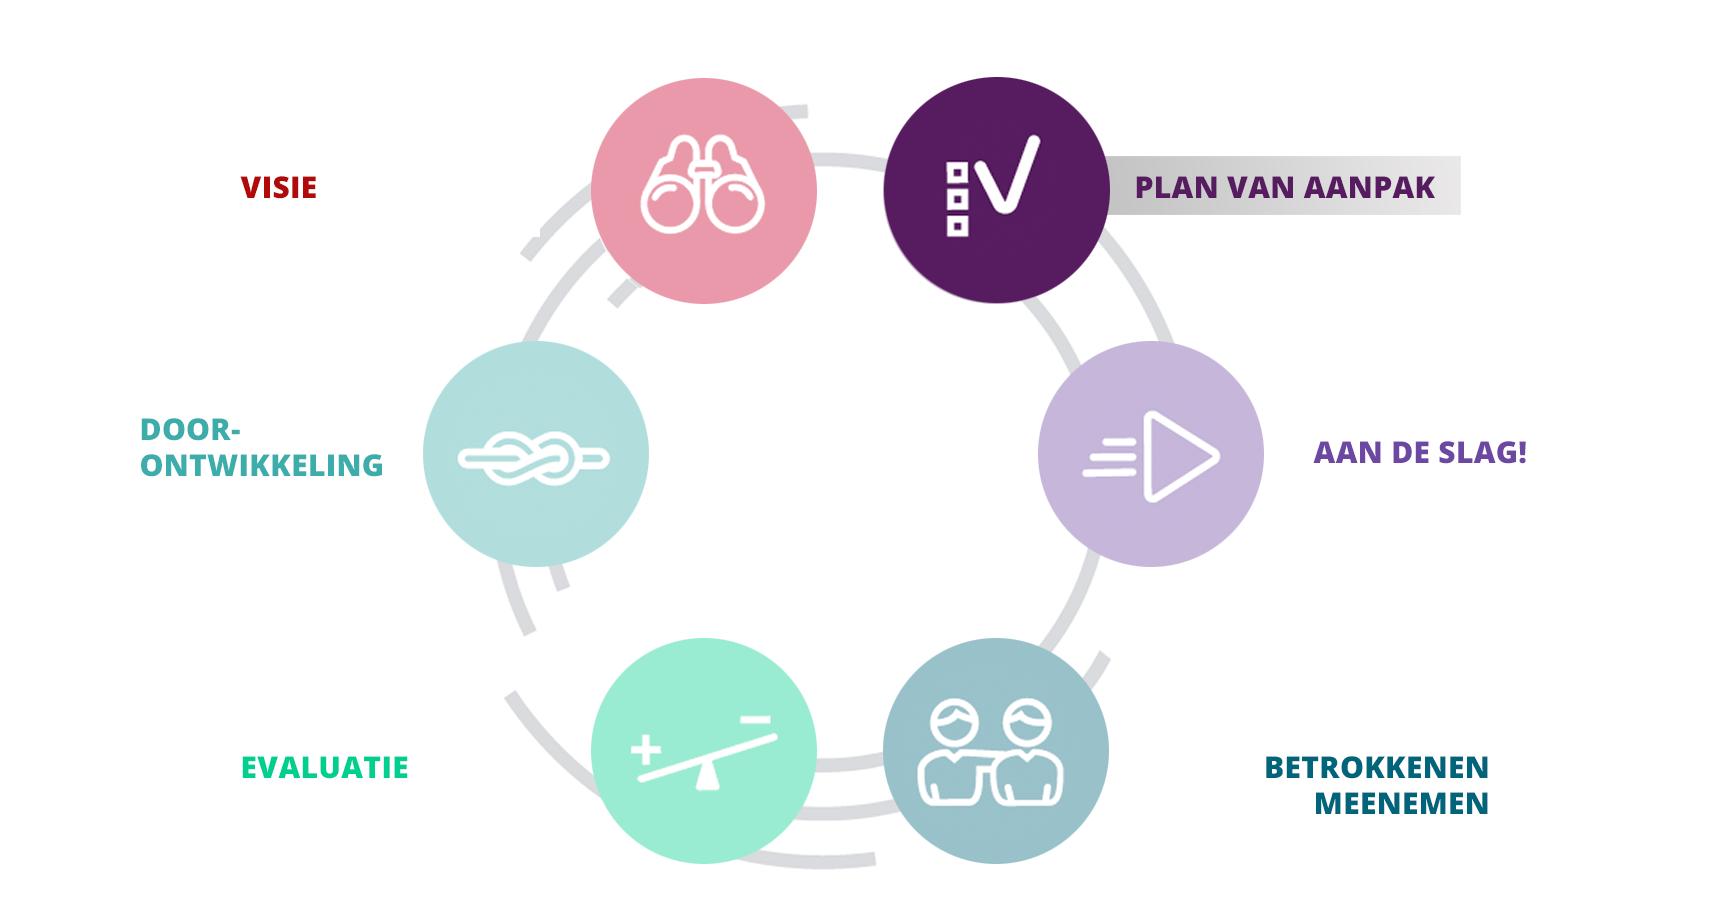 het plan van aanpak Routekaart veranderaanpak: plan van aanpak   Leerling 2020